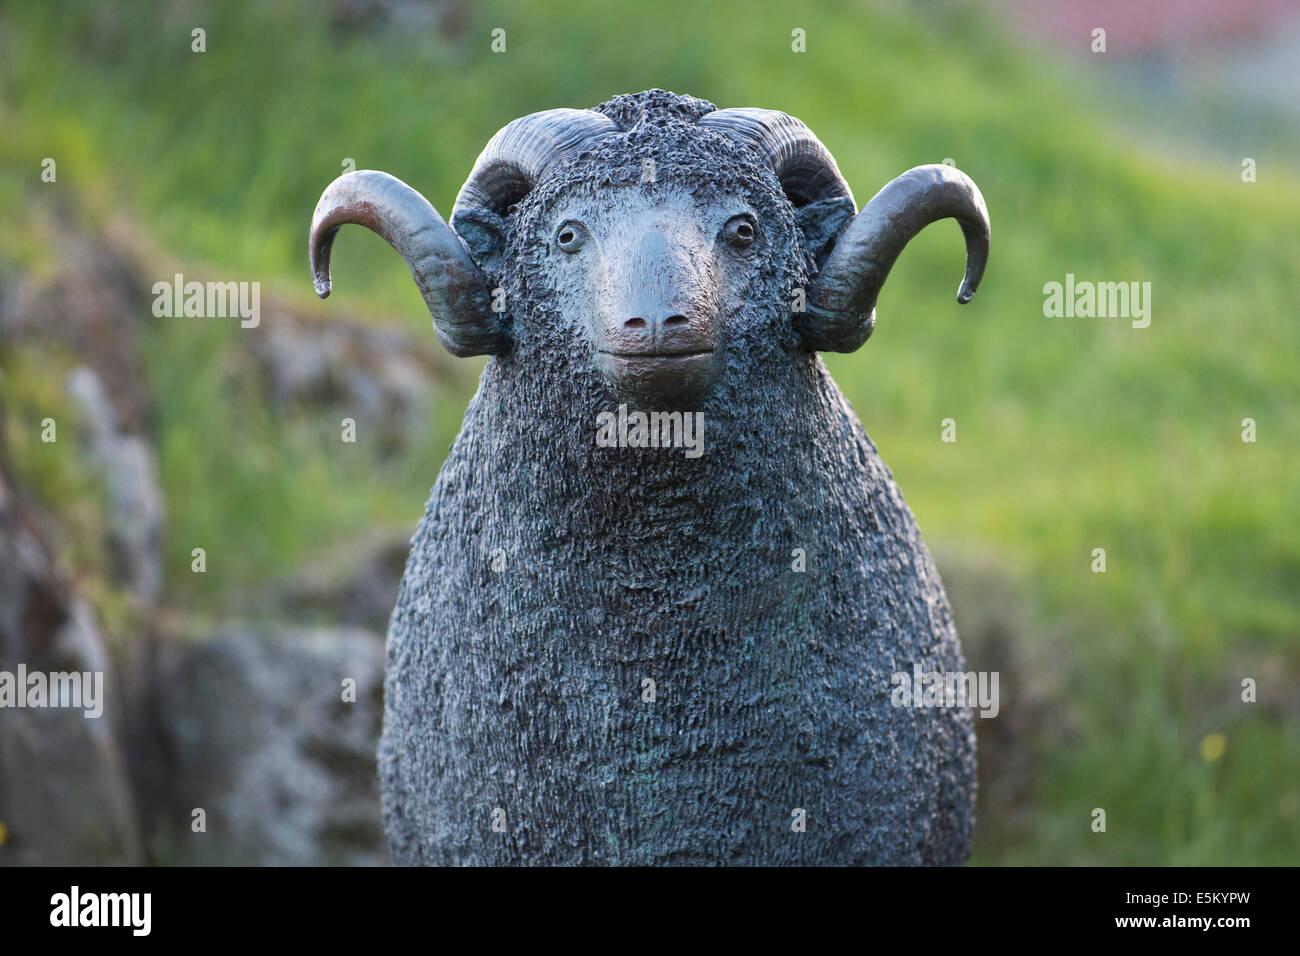 Statue of a ram, heraldic animal of the Faroe Islands, Tórshavn, Streymoy, Faroe Islands, Denmark - Stock Image